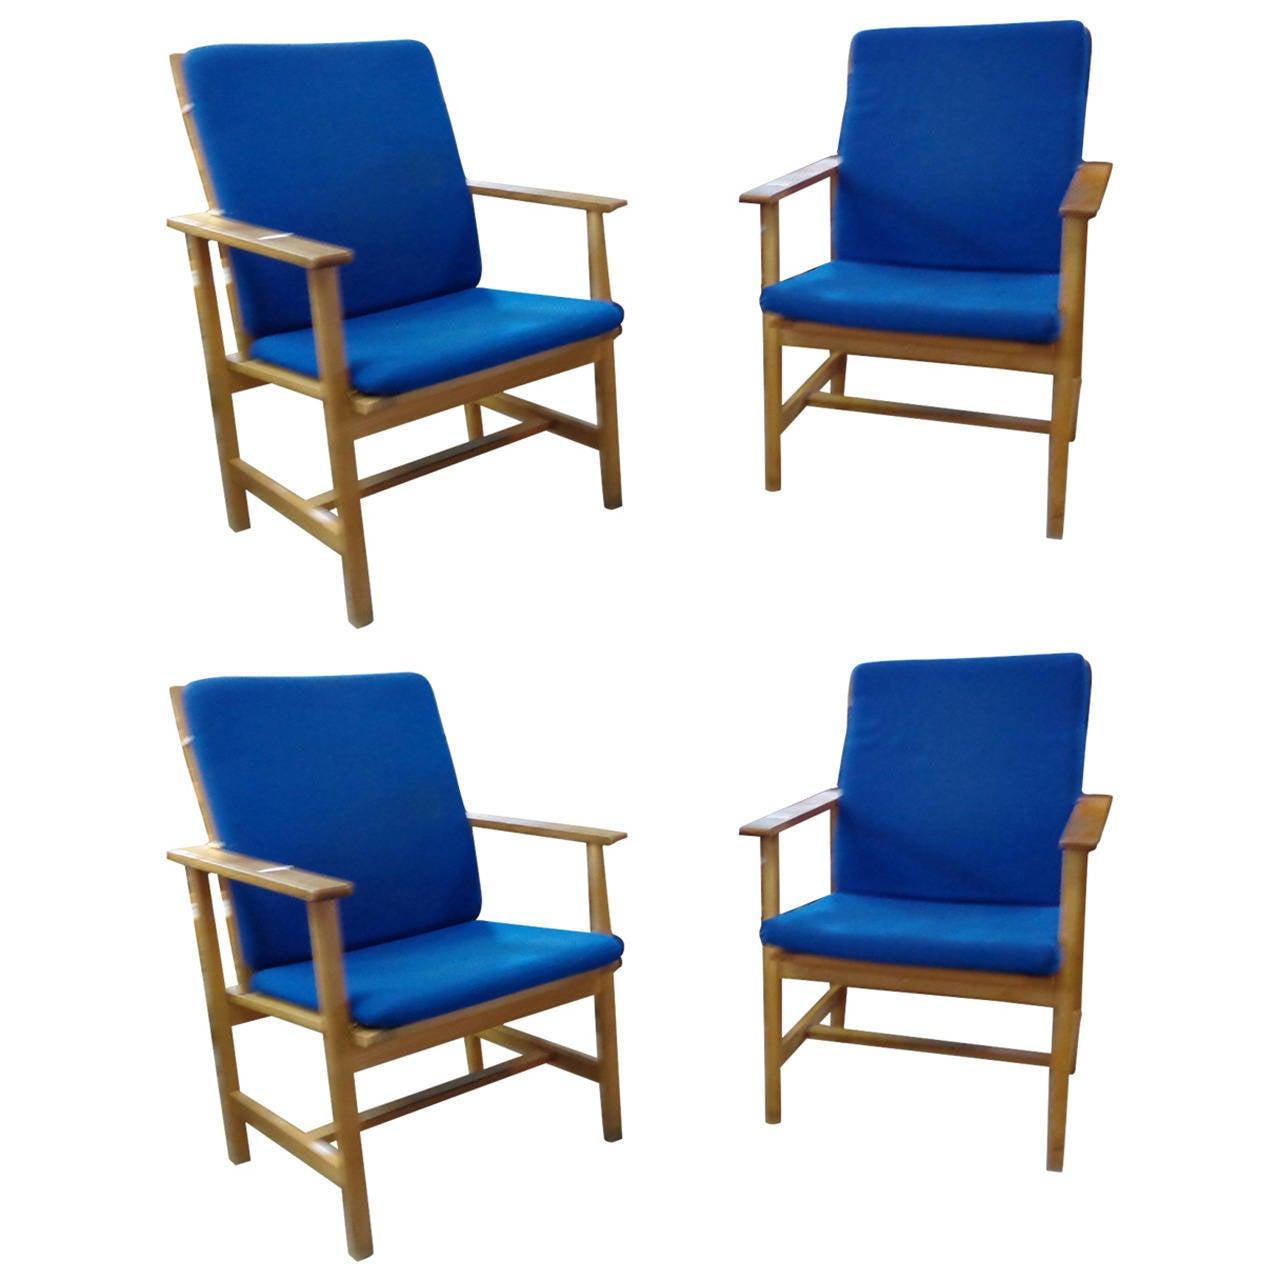 b rge mogensen oak armchairs with original blue wool. Black Bedroom Furniture Sets. Home Design Ideas